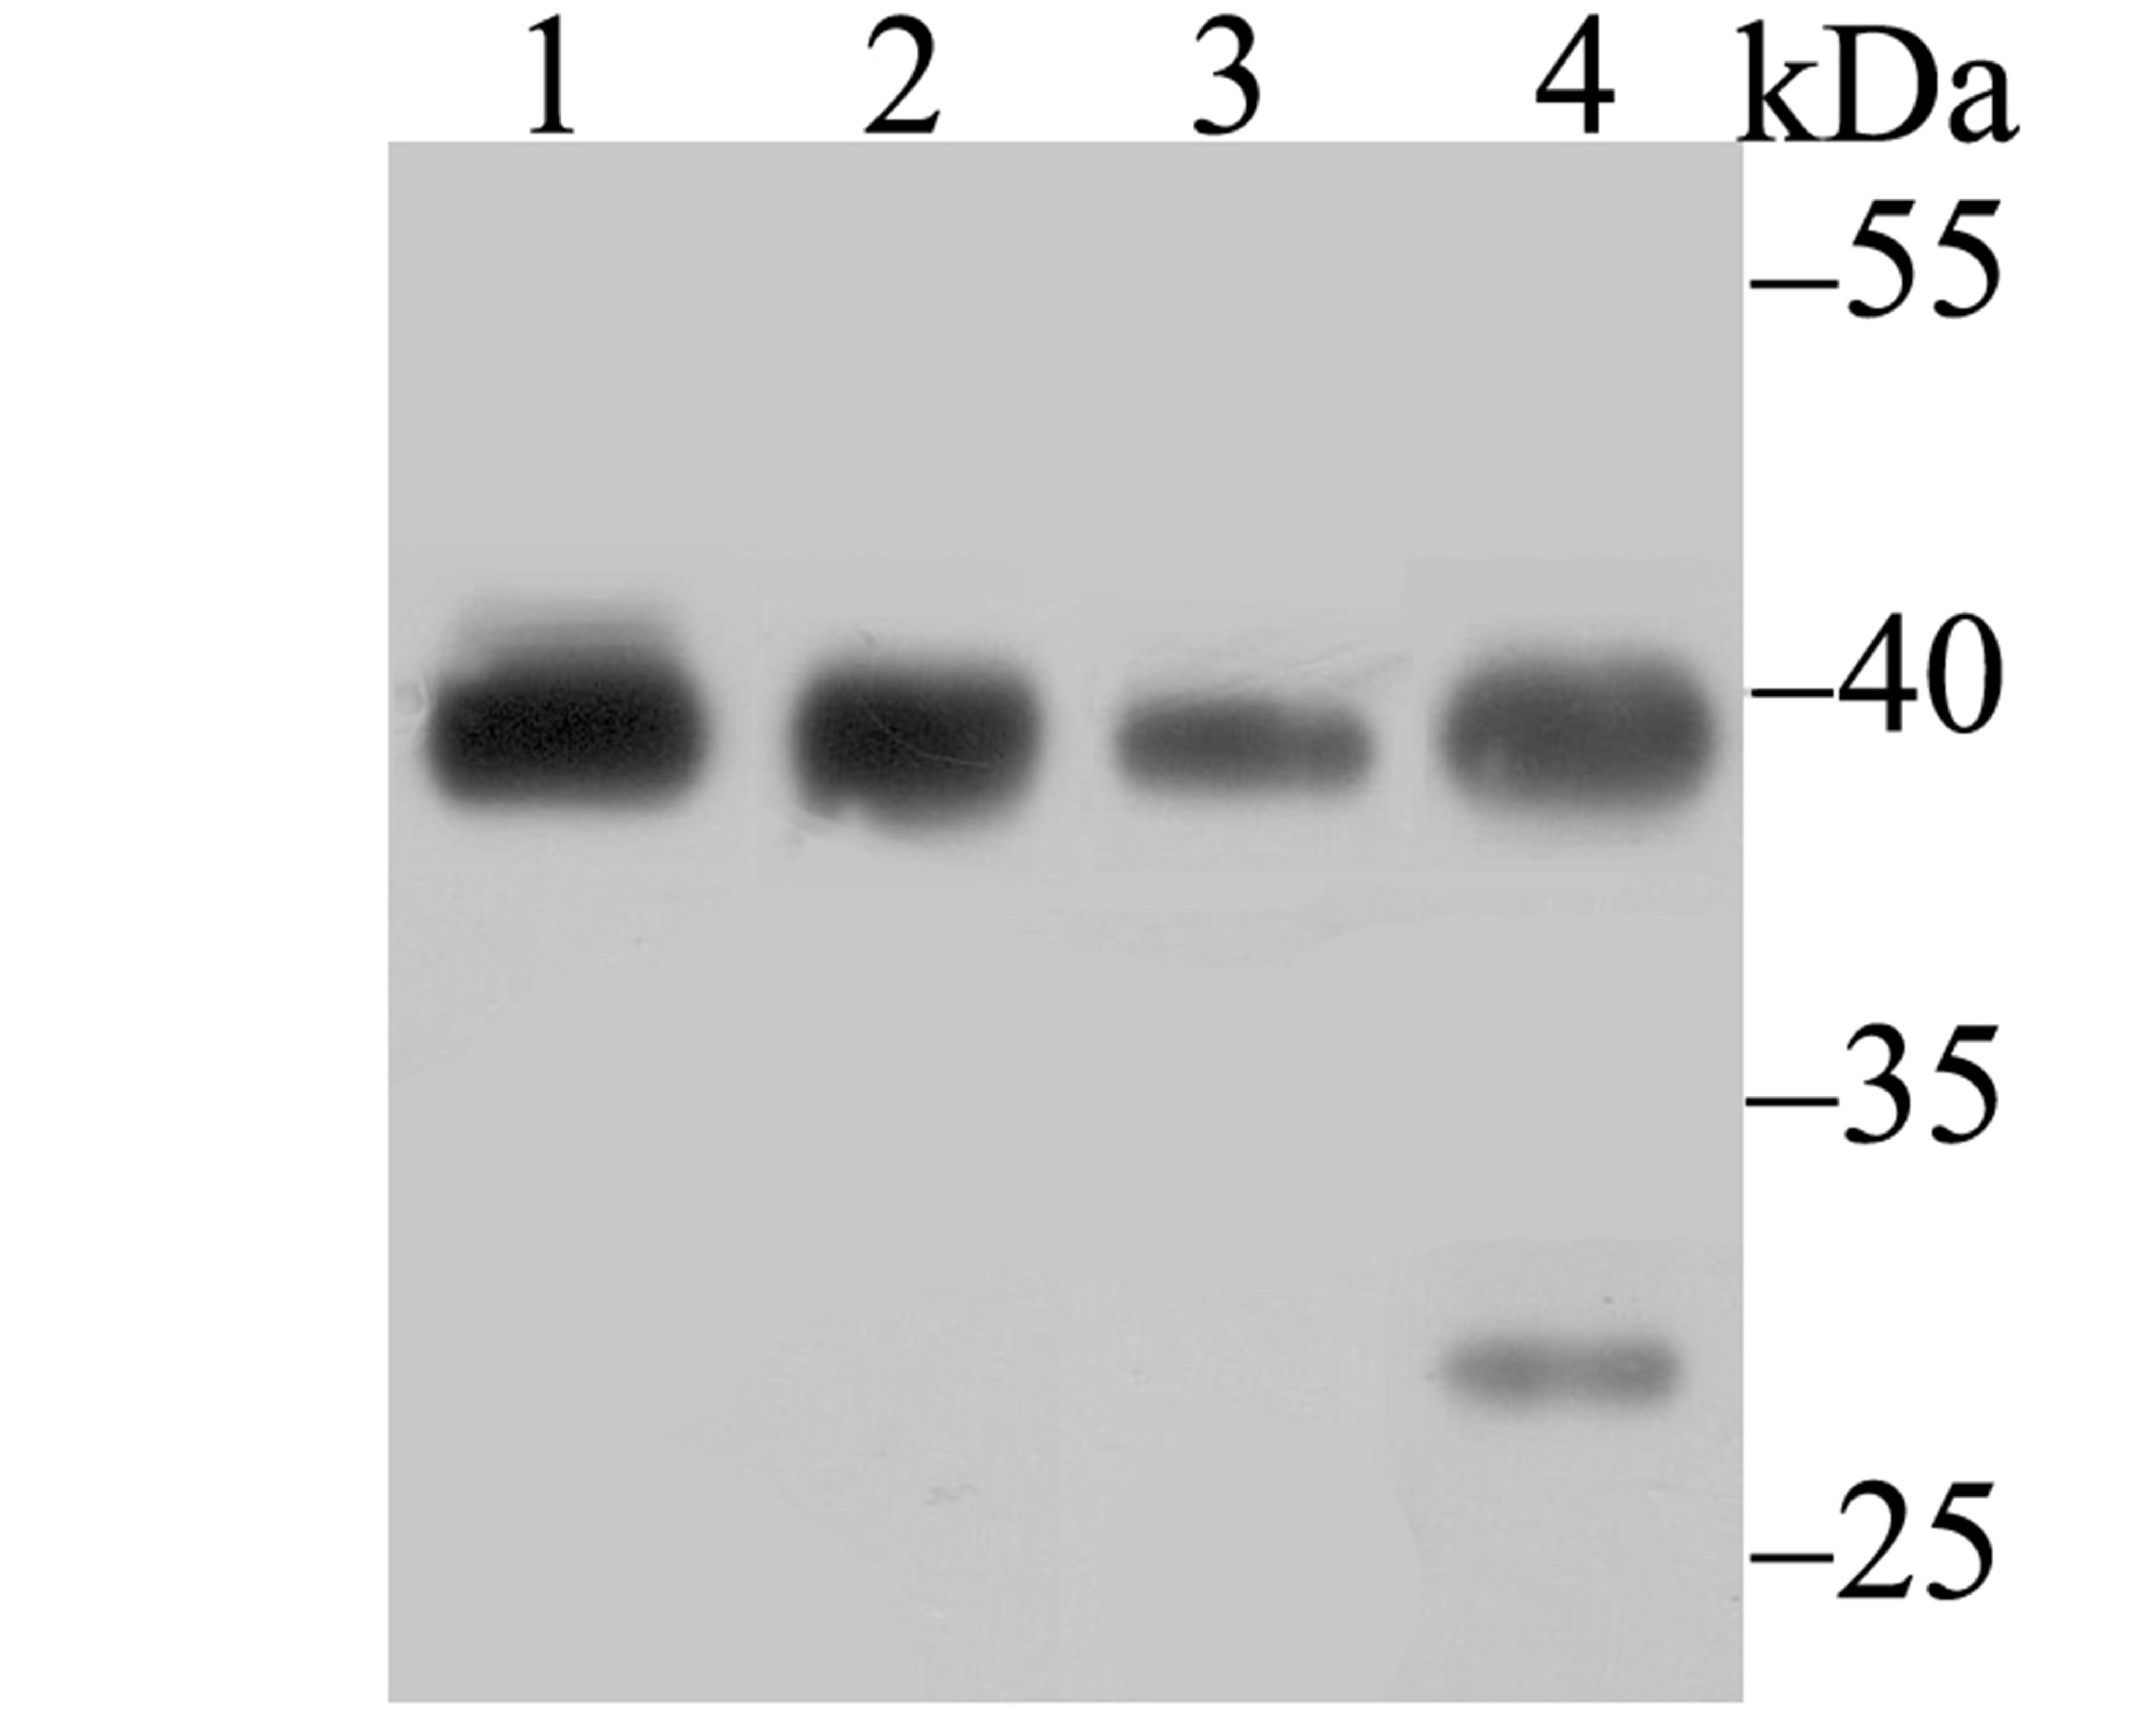 Western blot analysis of Bub3 on different lysates using anti-Bub3 antibody at 1/500 dilution.<br />  Positive control:<br />  Lane 1: A549<br />         Lane 2: HL-60<br />  Lane 3: A431  <br />       Lane 4: Rat colon